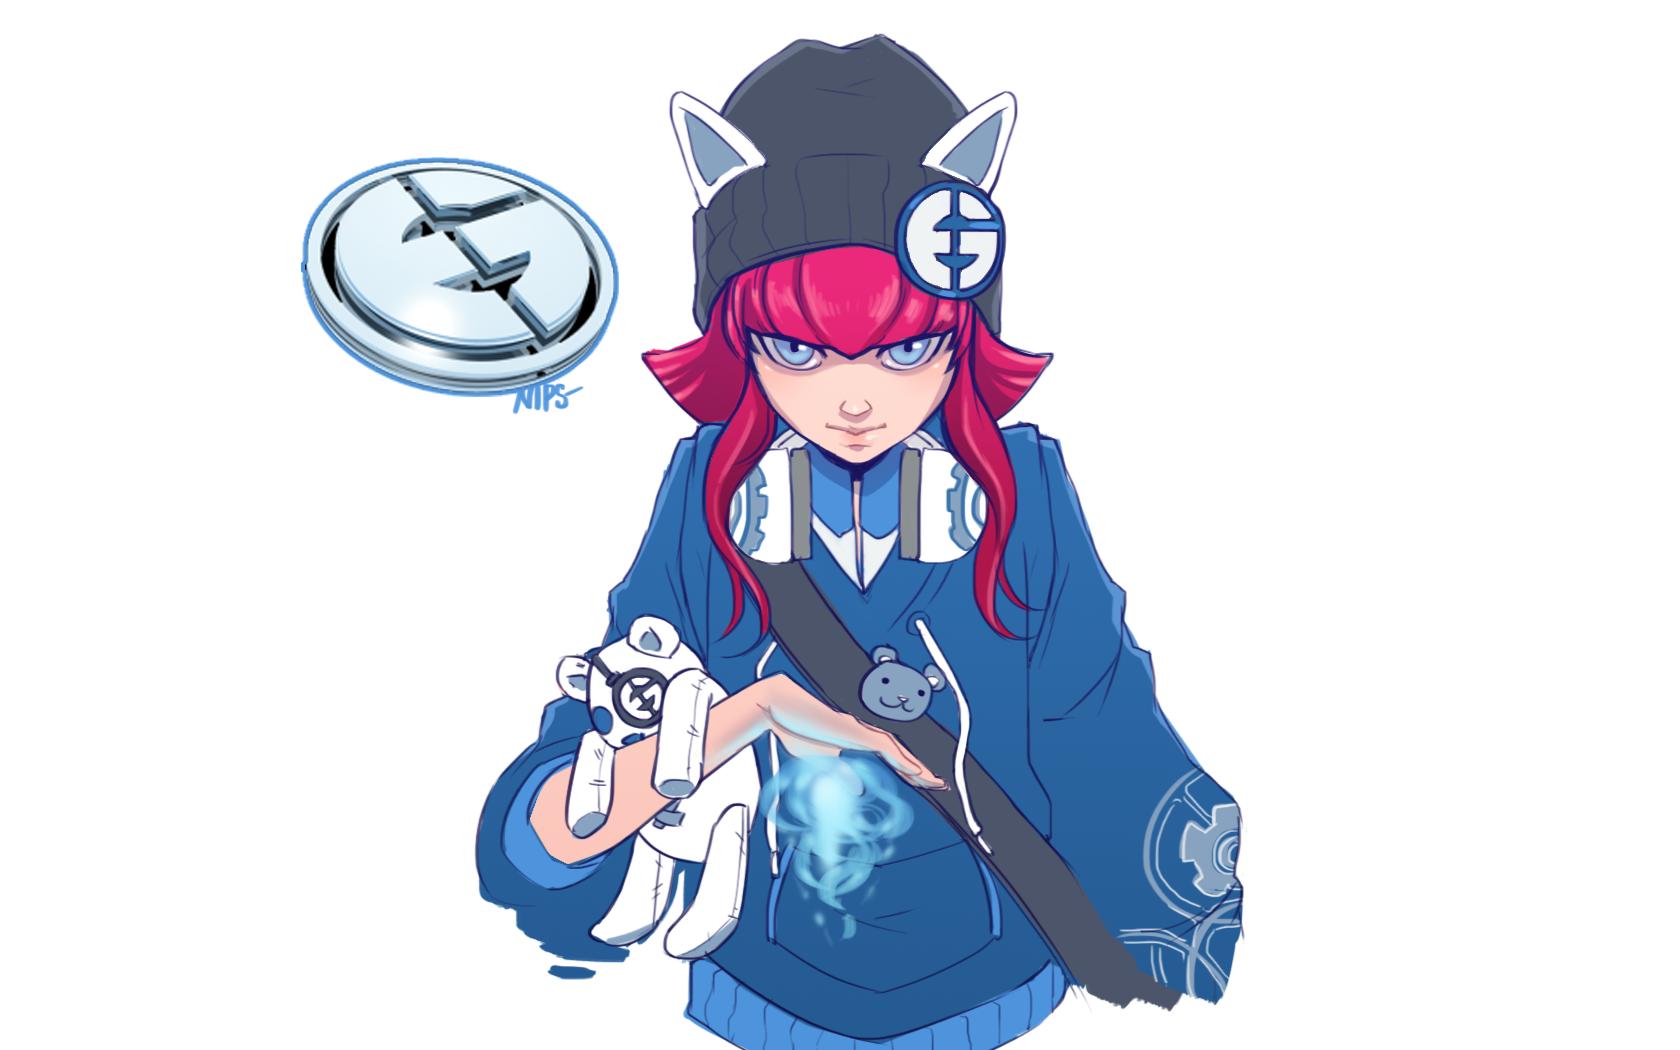 Wallpaper Illustration Anime League Of Legends Cartoon Annie